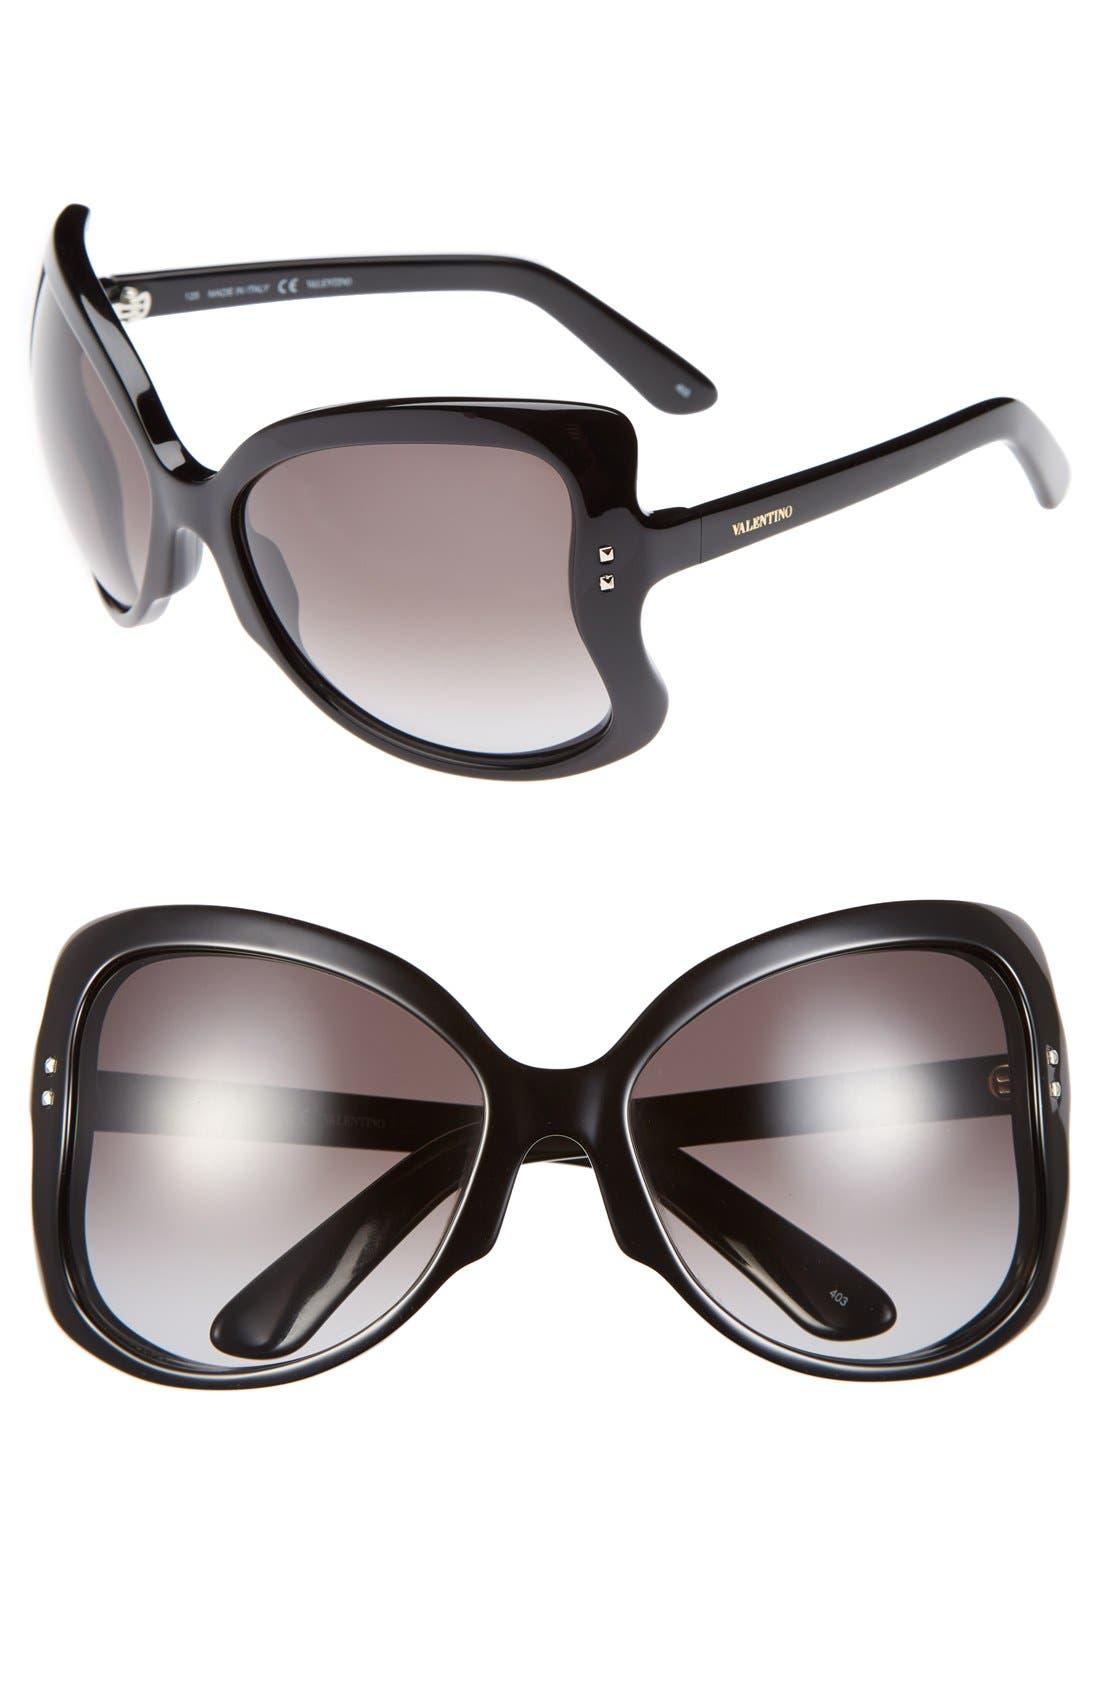 Main Image - Valentino 'Rockstud - Butterfly' 61mm Sunglasses